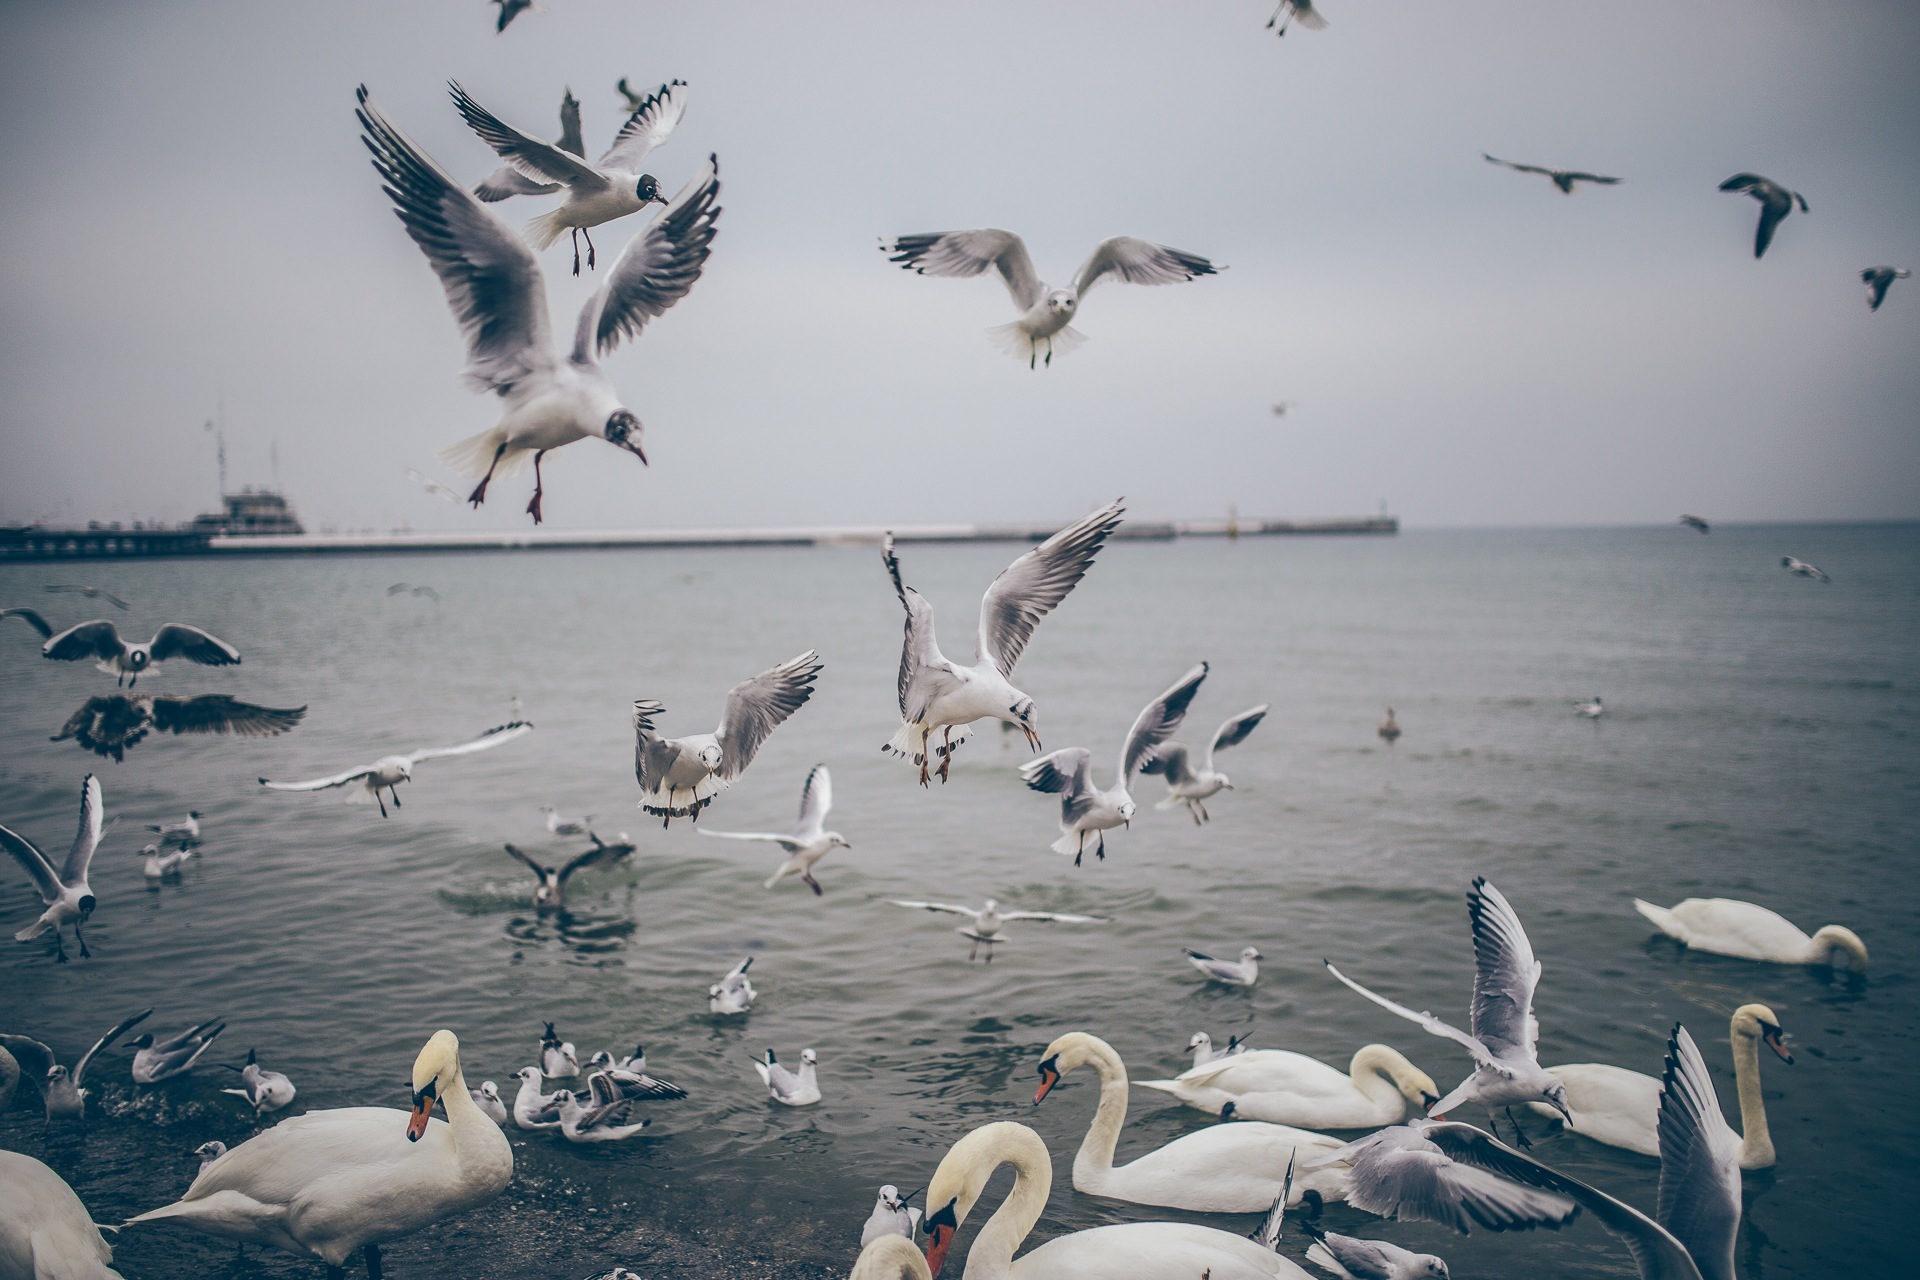 pájaros, cisnes, gaviotas, पानी, जीवन रक्षा - HD वॉलपेपर - प्रोफेसर-falken.com